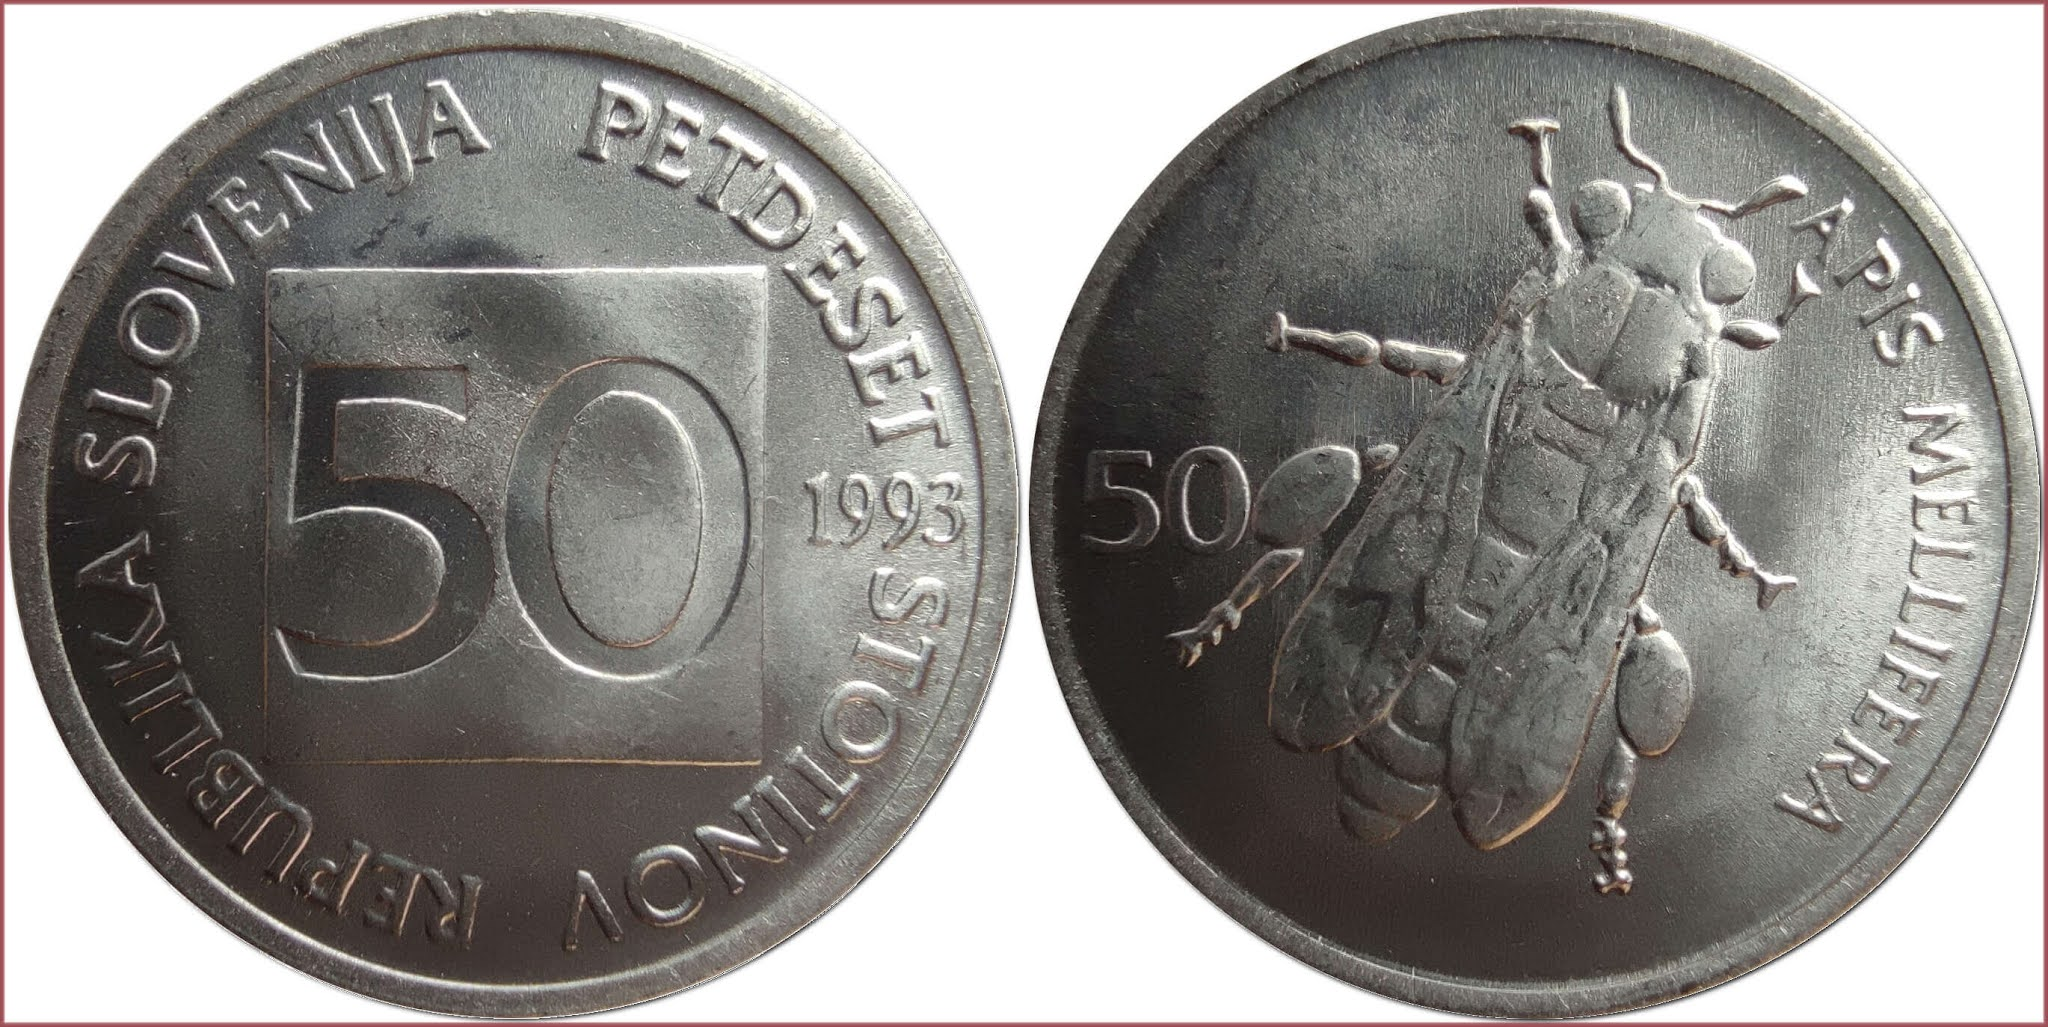 50 stotin, 1993: Republic of Slovenia